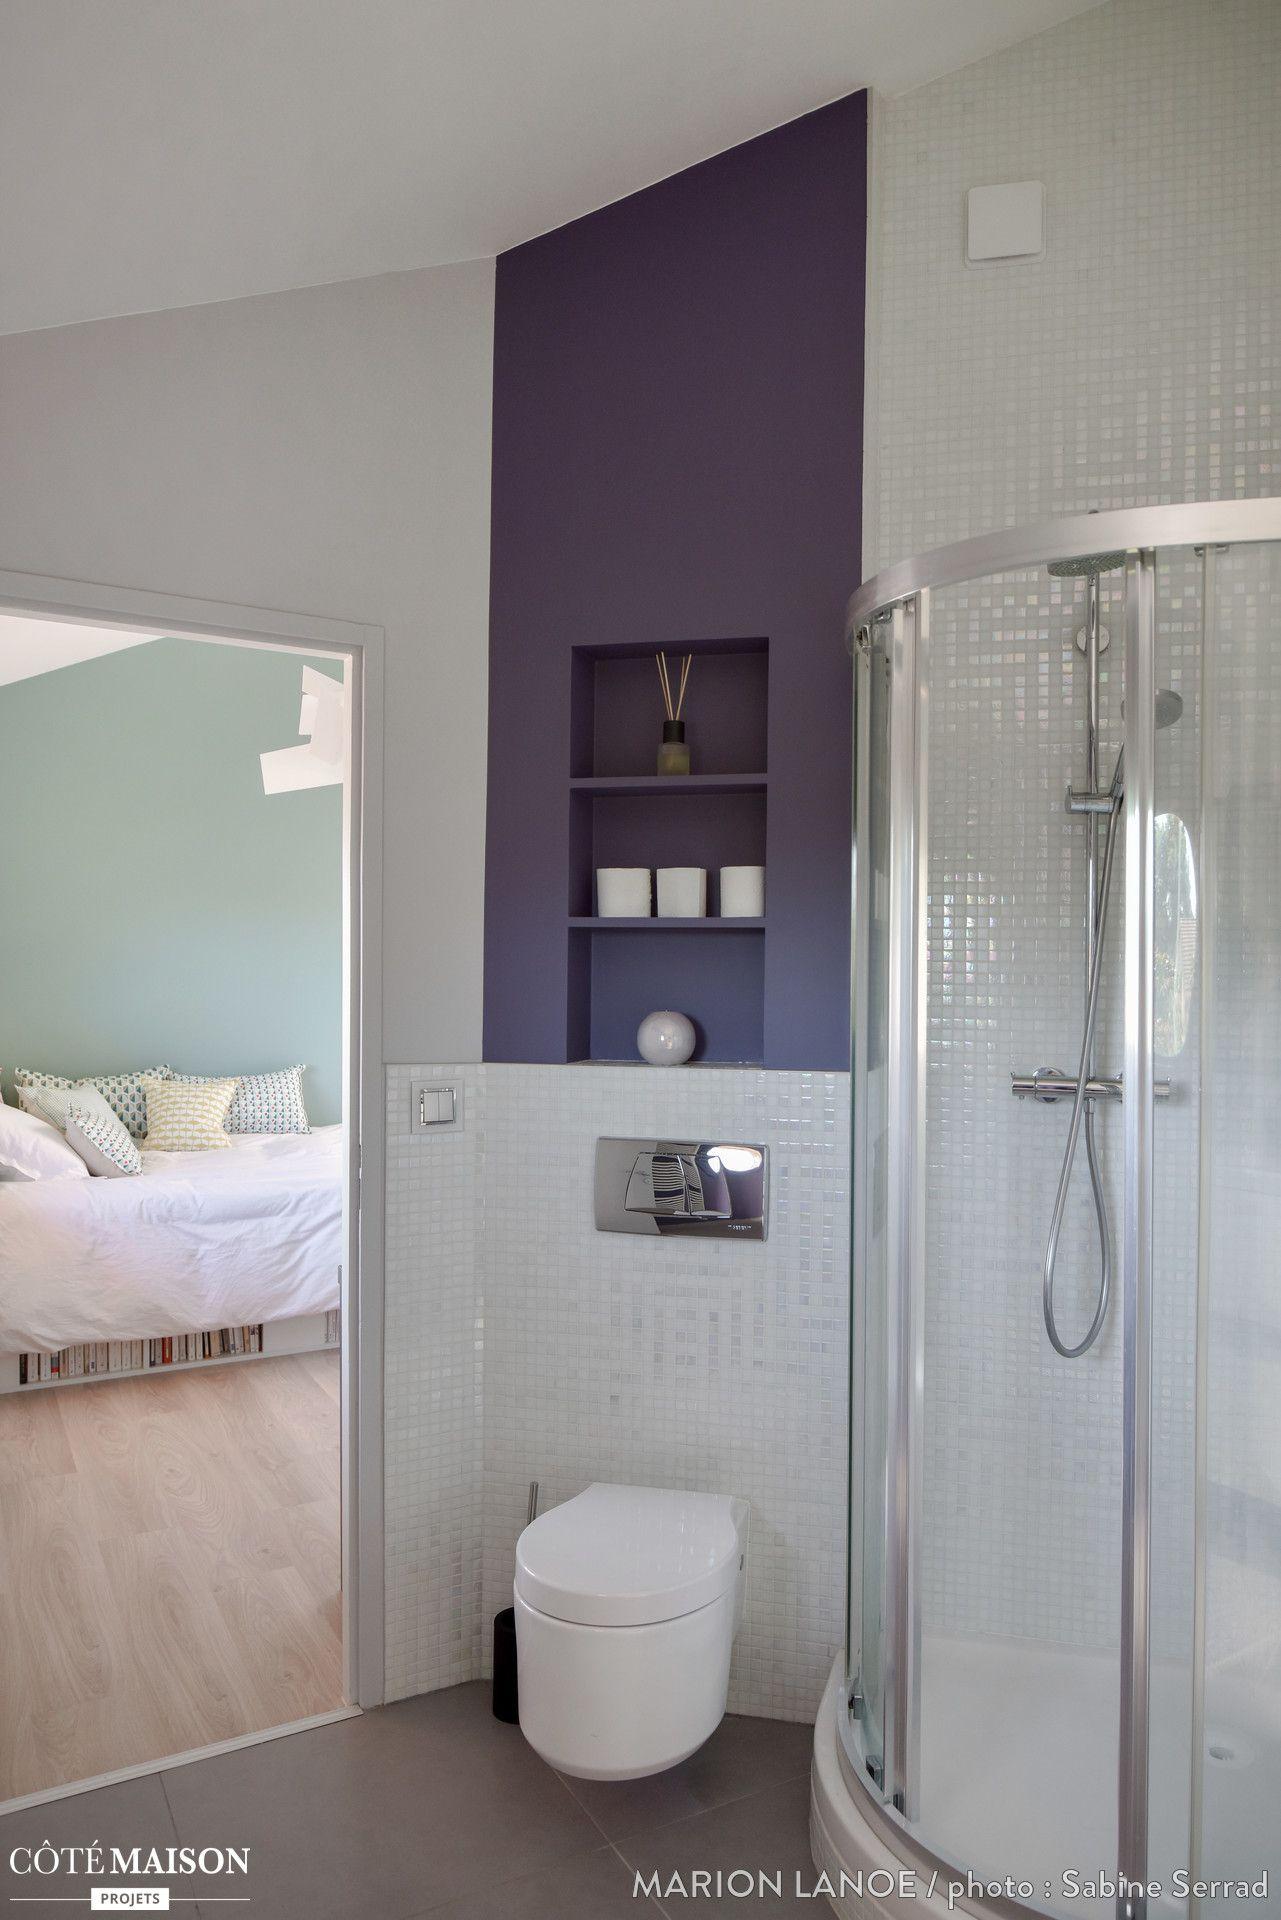 une salle de bains moderne en accord avec le design scandinave de